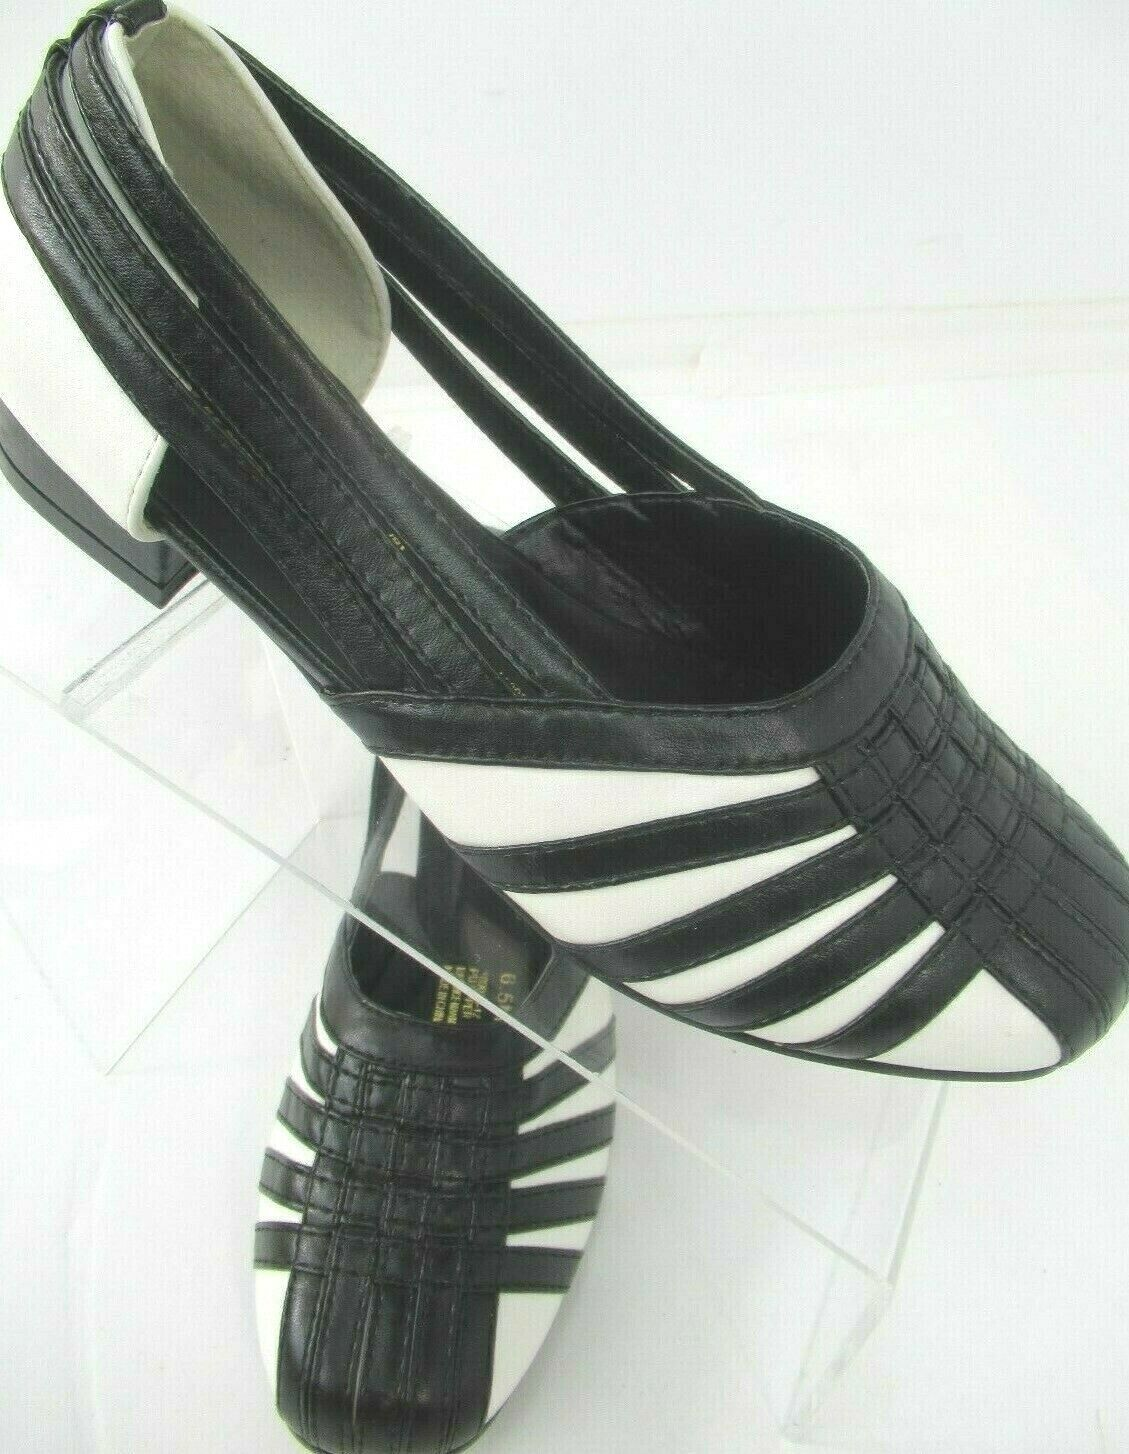 Sofwear Femme Slip On Simili cuir supérieur noir blanc pointure 6.5 M NEUF - 4602